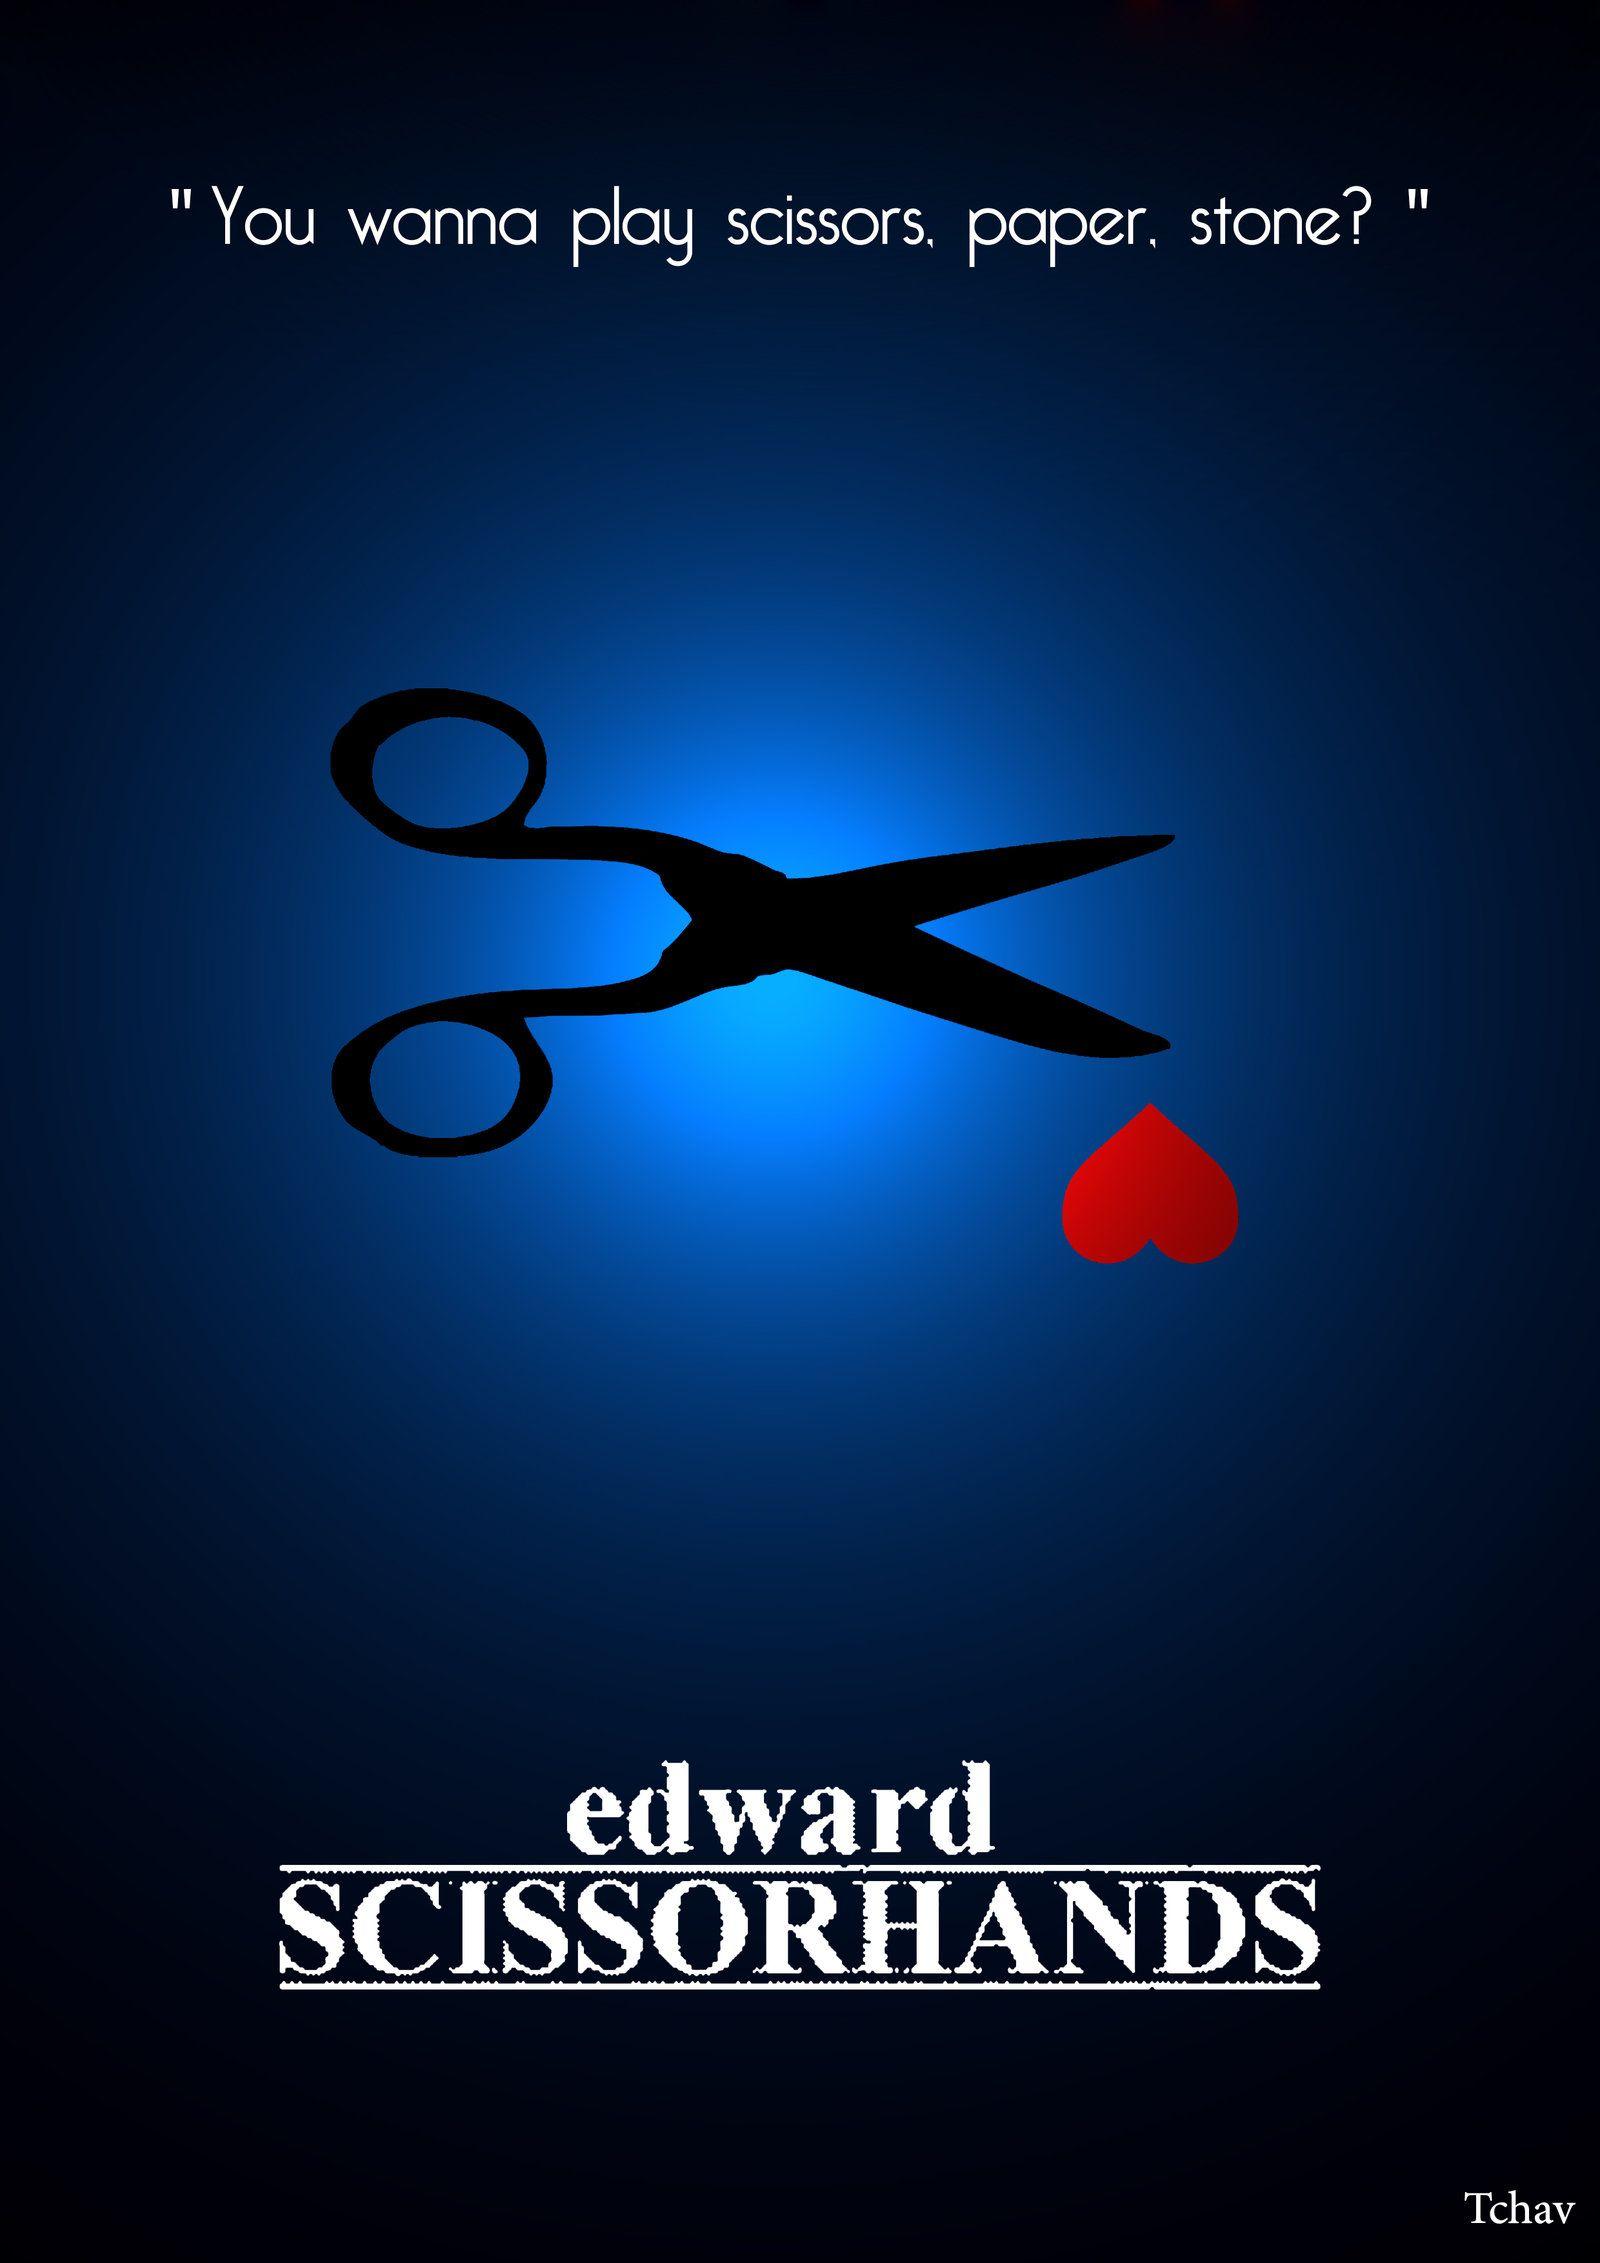 Edward Scissorhands By Tchav Minimalist Poster Edward